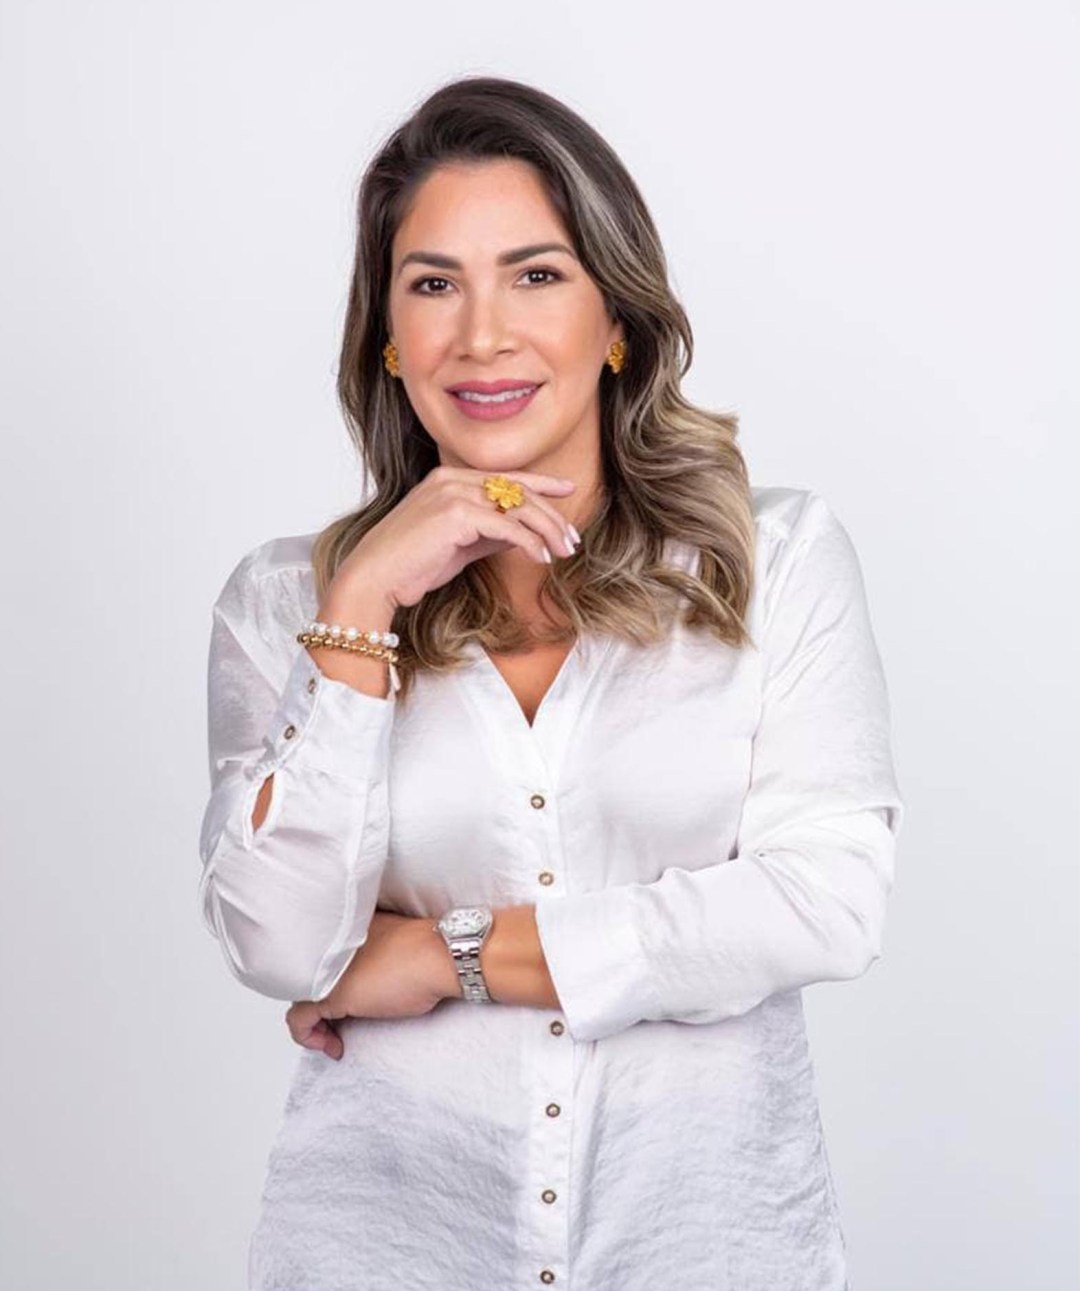 Andrea Angel